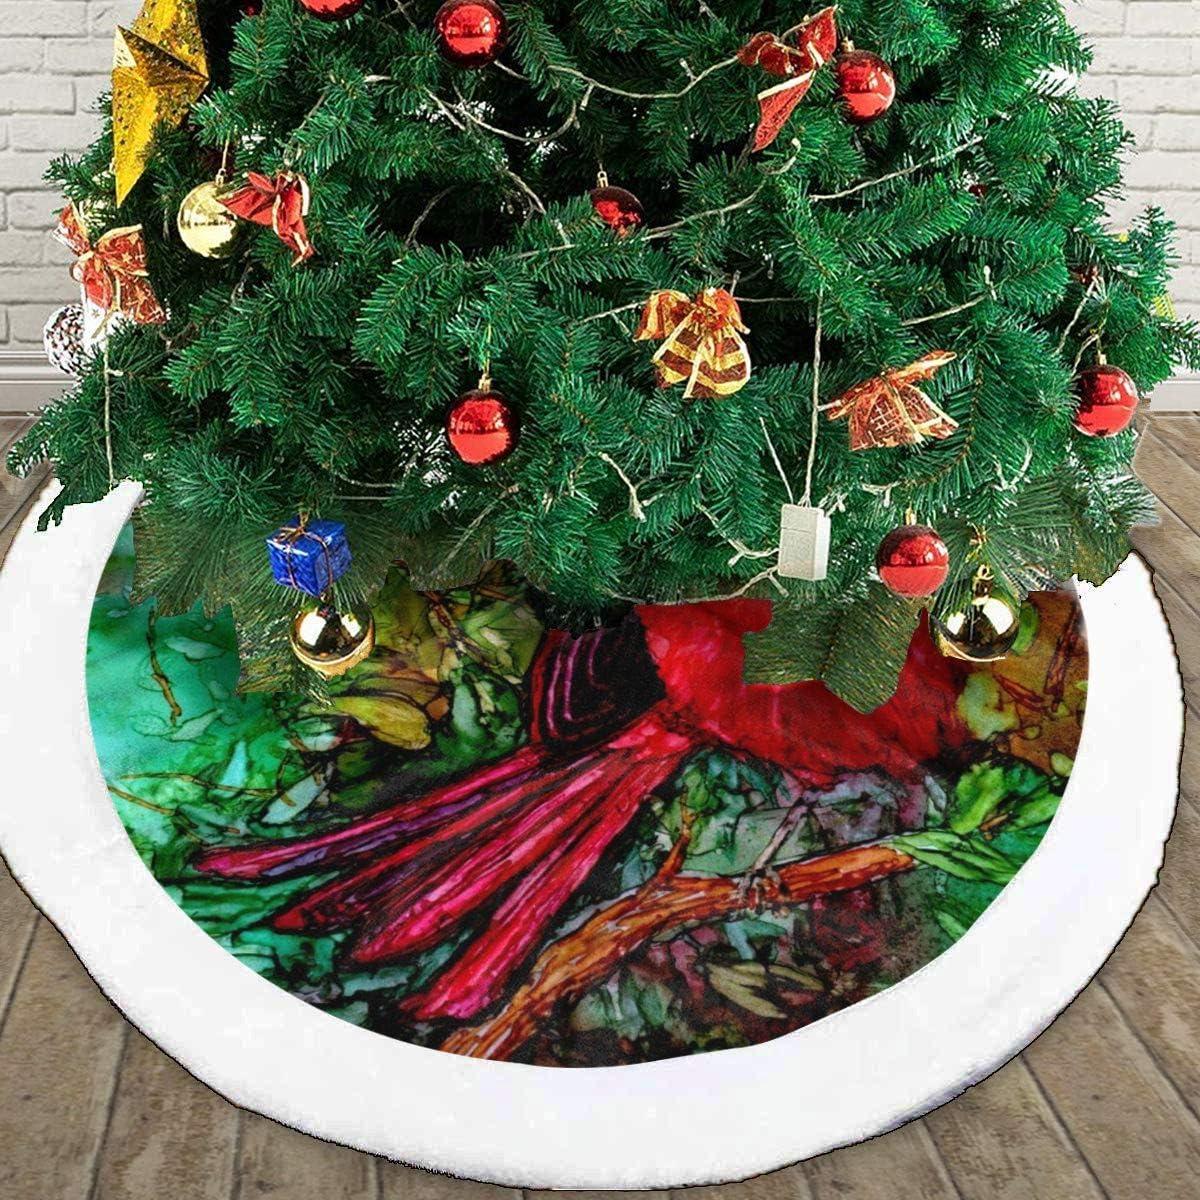 FENTINAYA Christmas Tree Skirt 30in Black Vinyl Record Custom Tree Skirt For Holiday Party Christmas Decorations